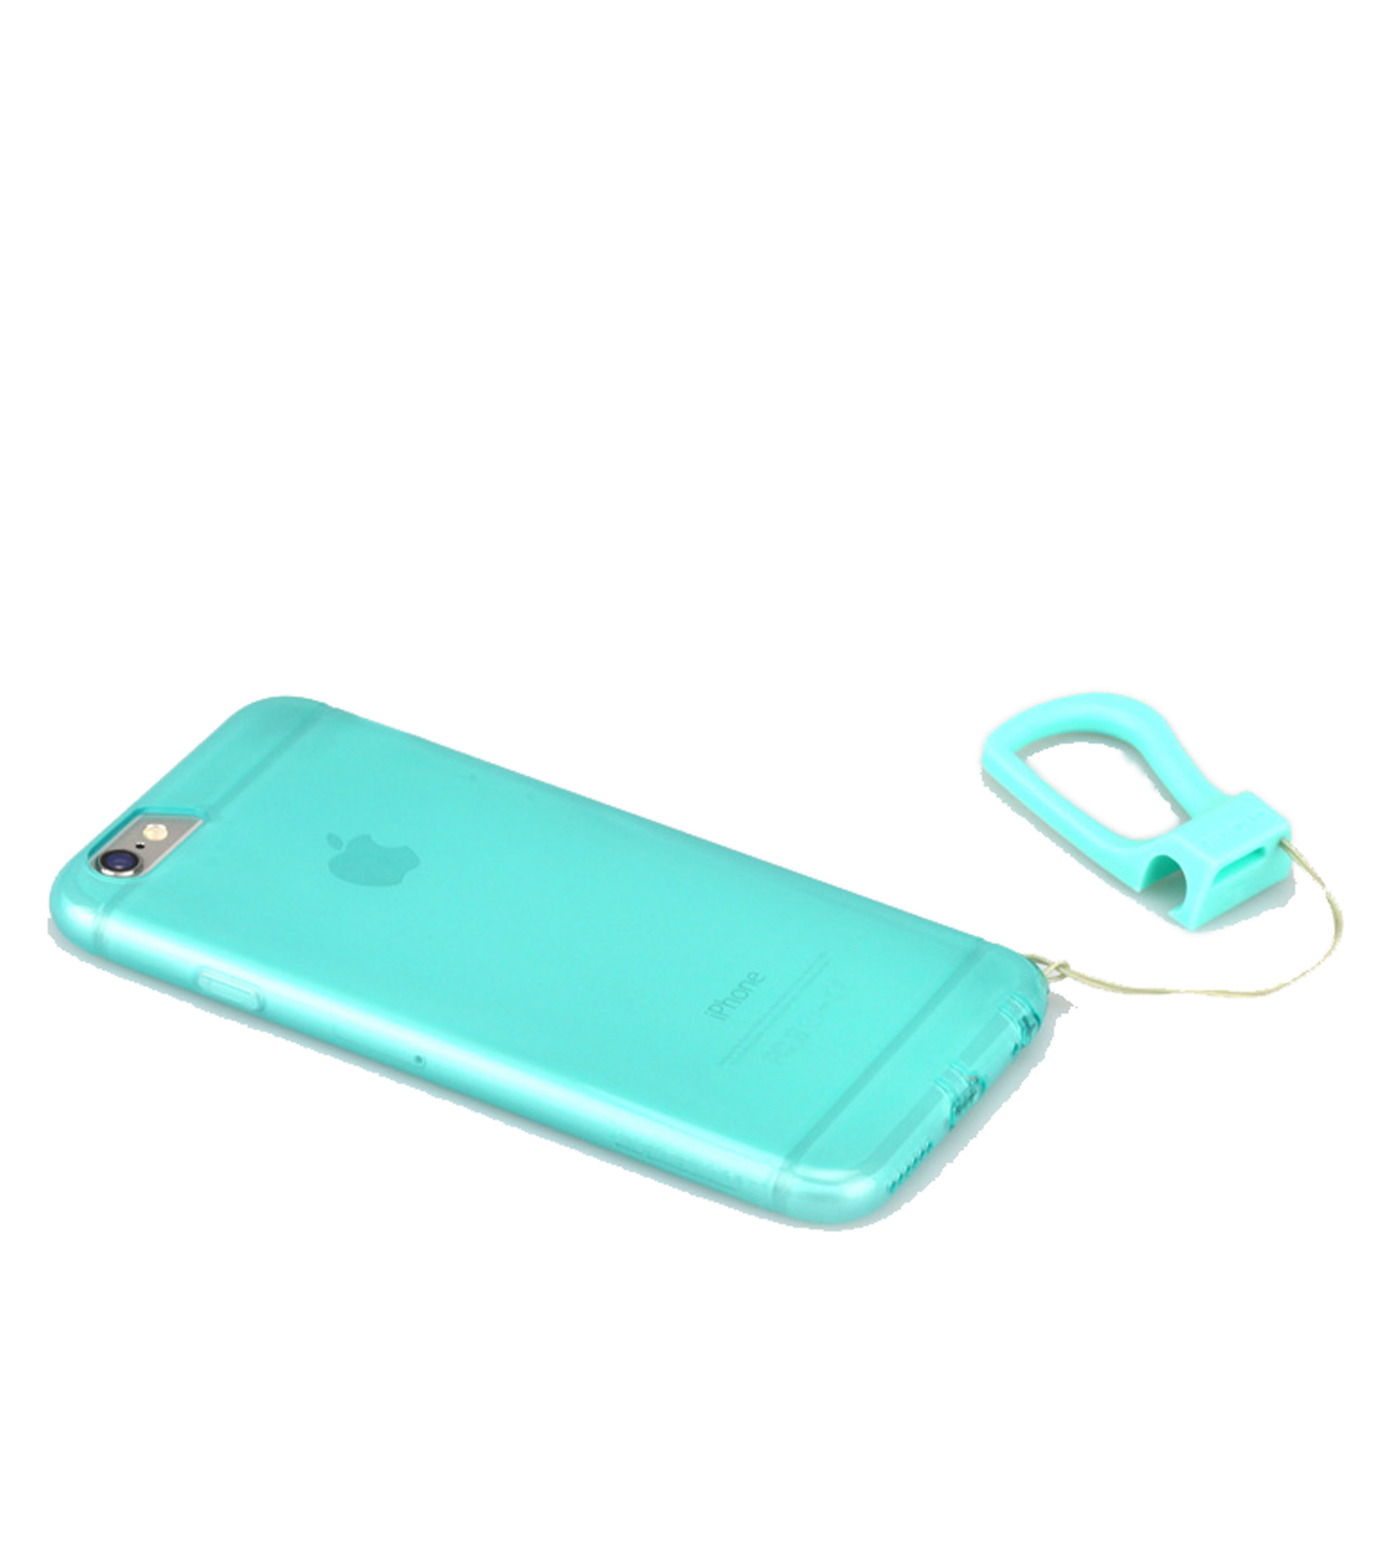 Tunewear(チューンウエア)のsoftshell 6/6s-NONE(ケースiphone6/6s/case iphone6/6s)-TUN-PH-0398-0 拡大詳細画像3